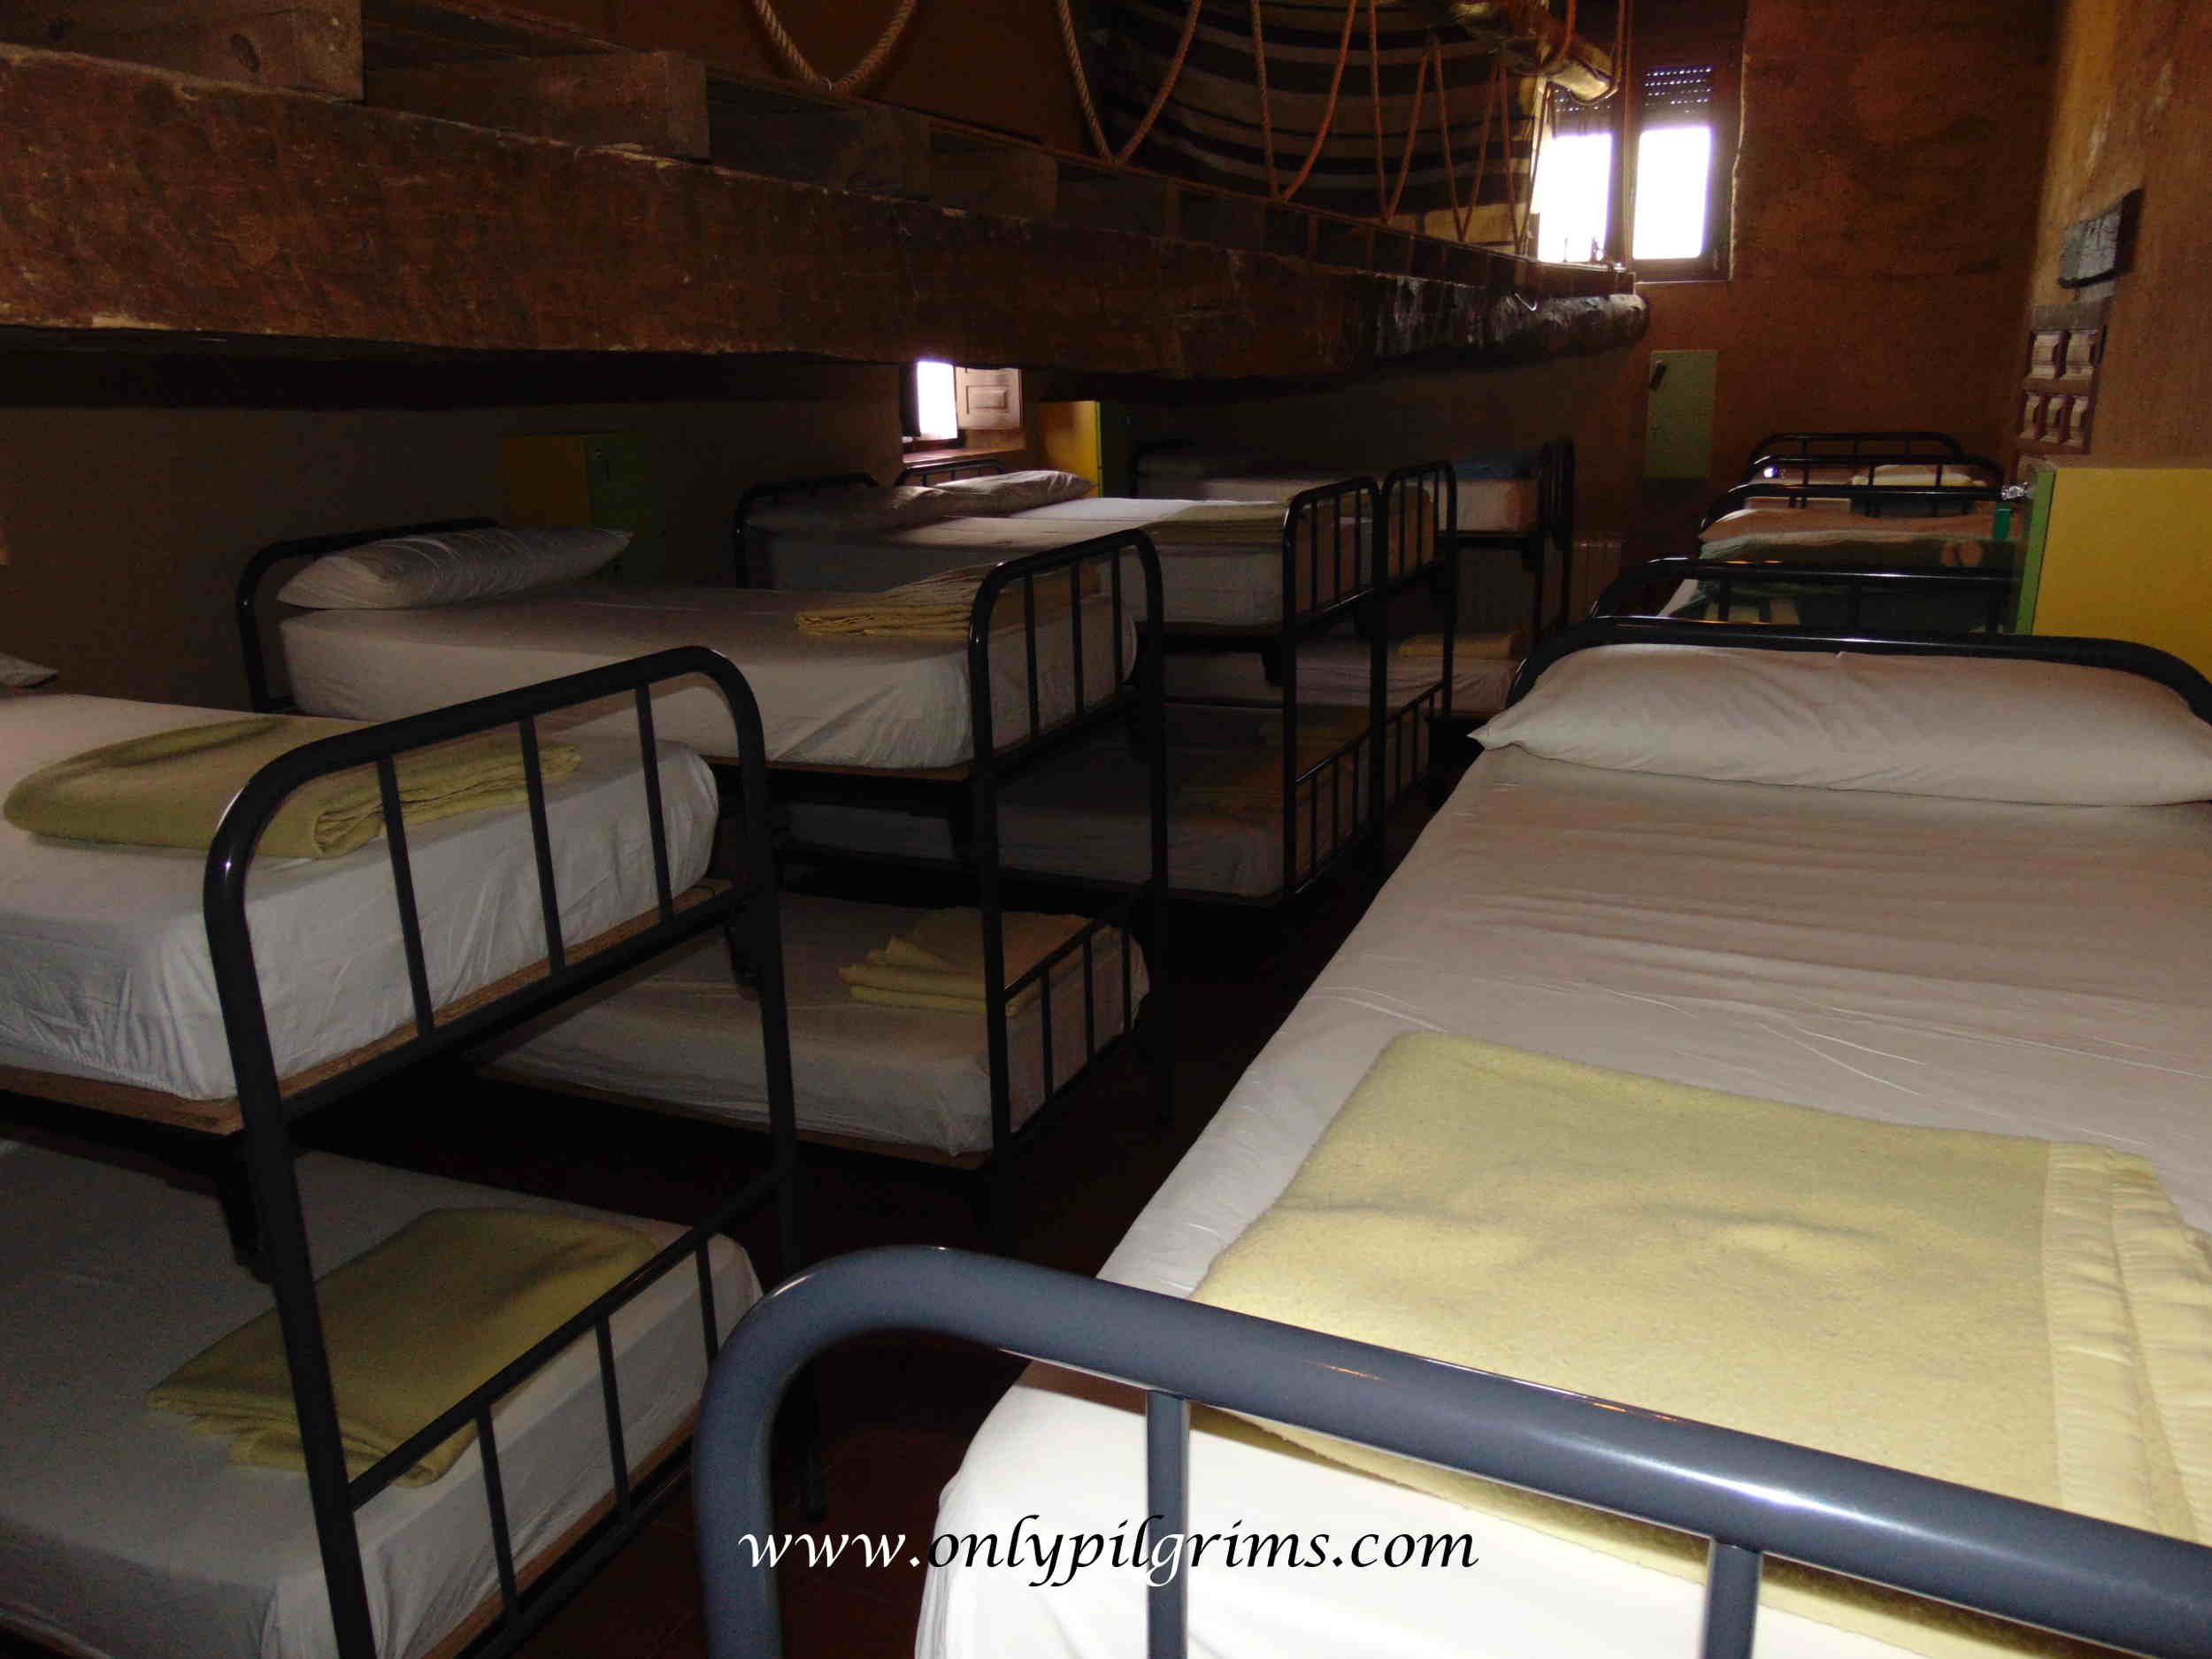 en el camino only pilgrims booking hostels